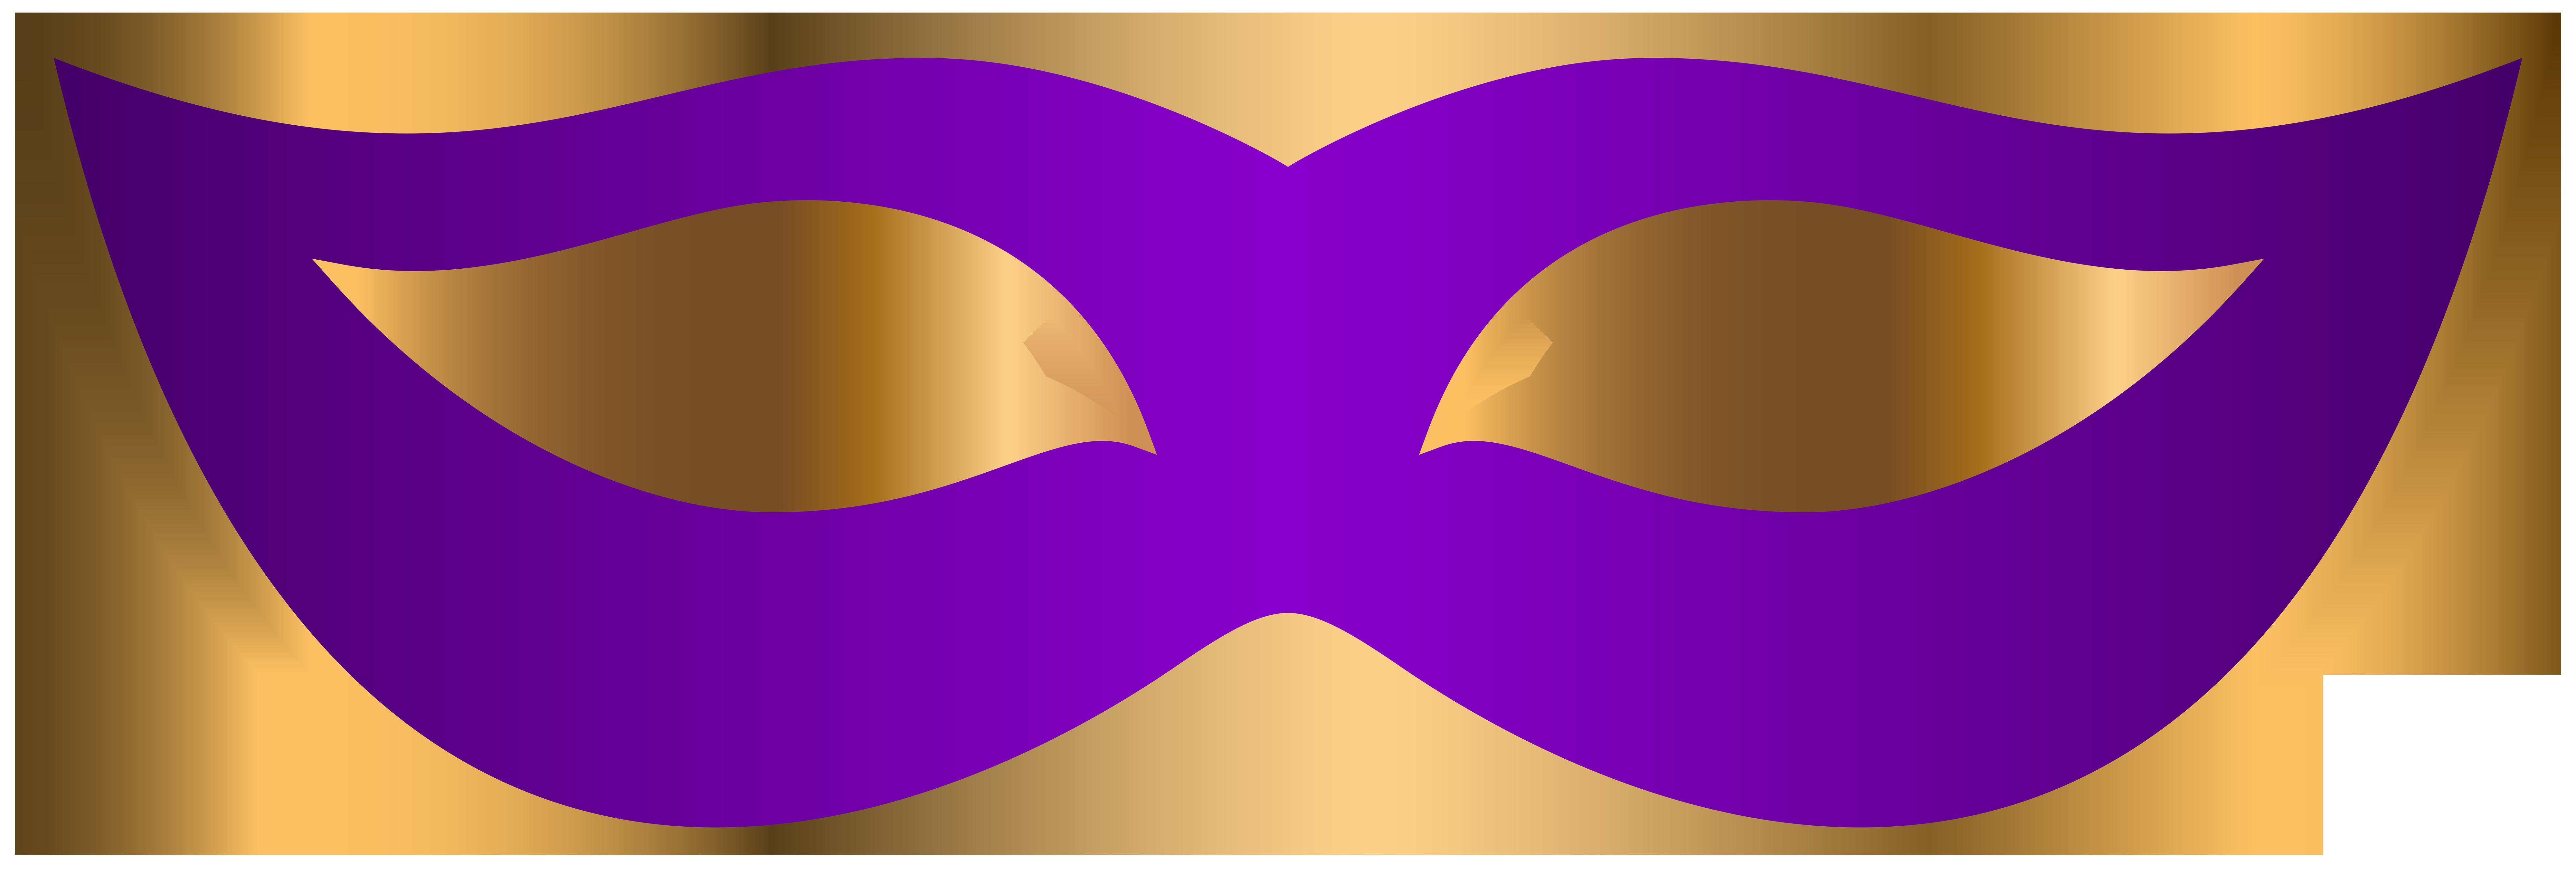 8000x2716 Purple Carnival Mask Png Clip Art Transparent Imageu200b Gallery